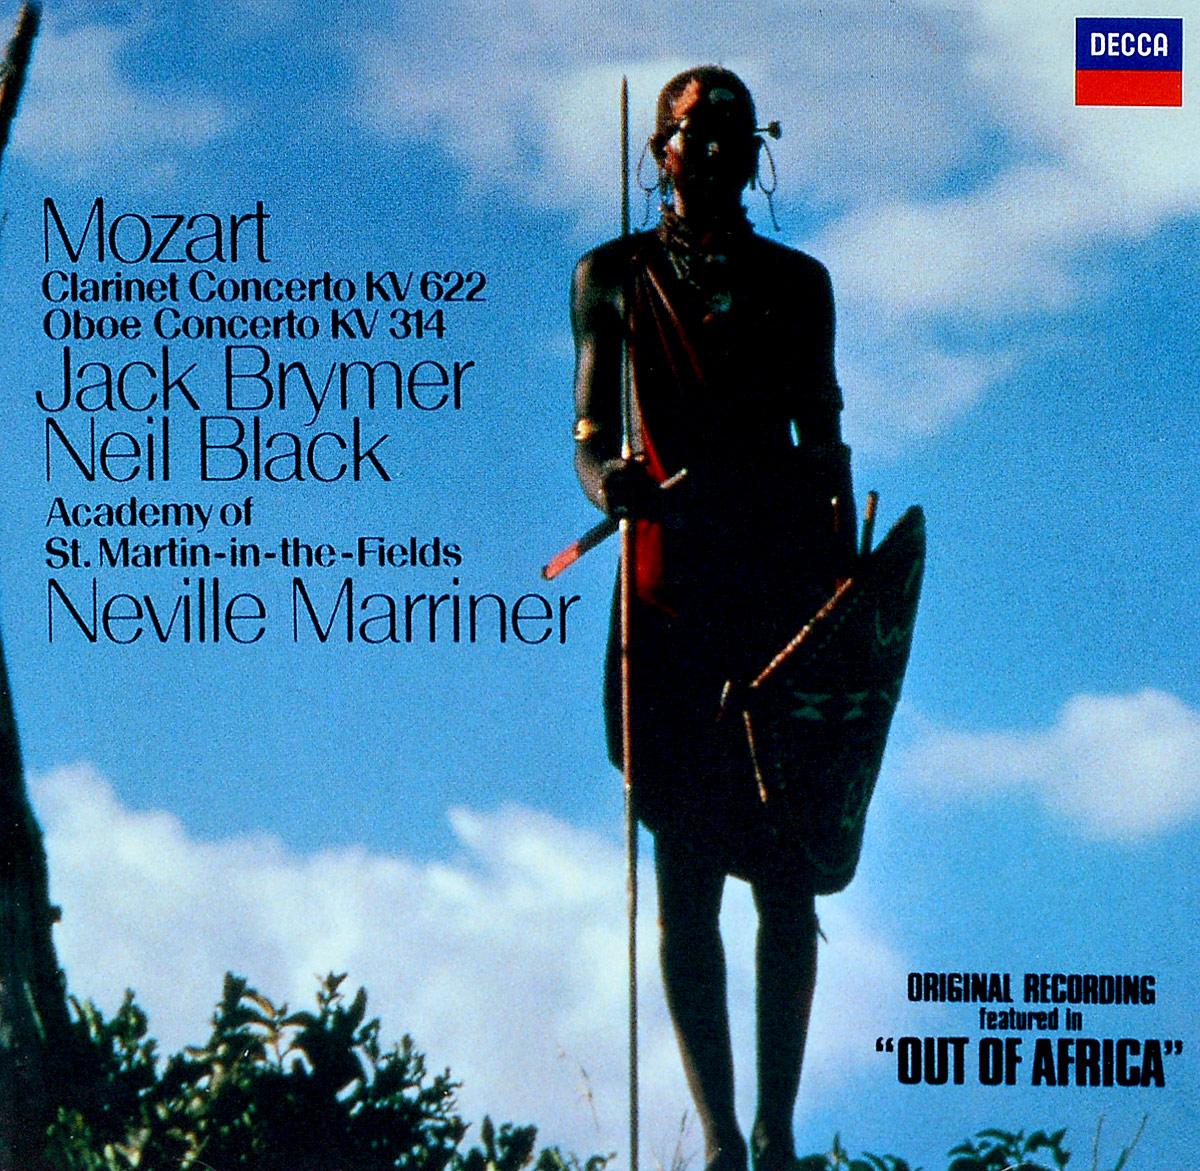 Джек Браймер,Нэвилл Мерринер Jack Brymer, Sir Neville Marriner. Mozart: Clarinet Concerto / Oboe Concerto